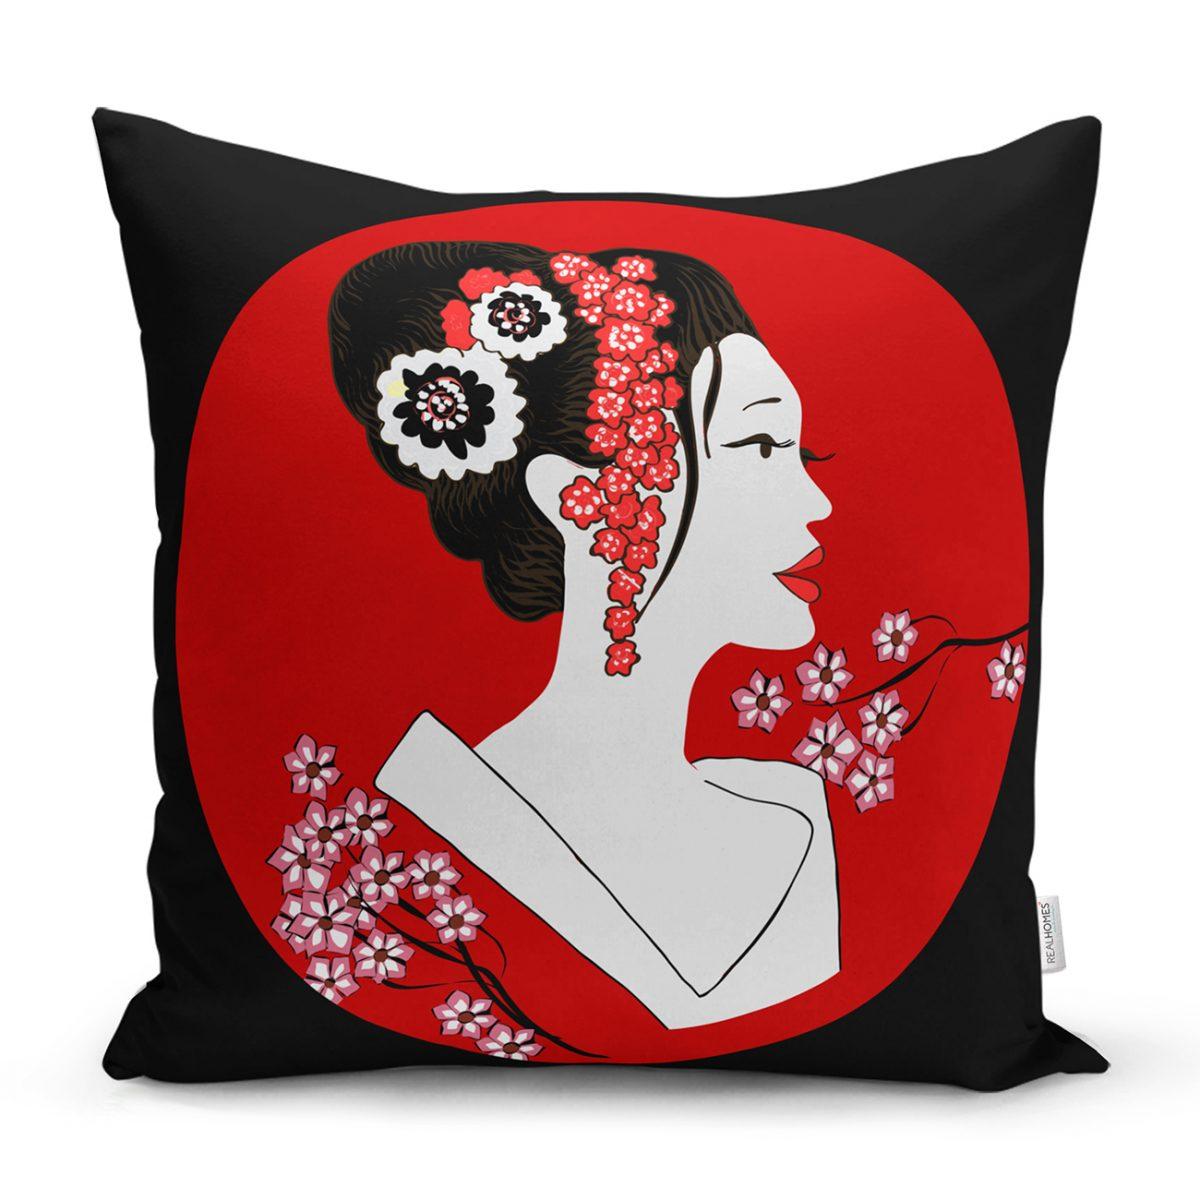 Siyah ve Kırmızı Zeminli Japon Kız Modern Kırlent Kılıfı Realhomes